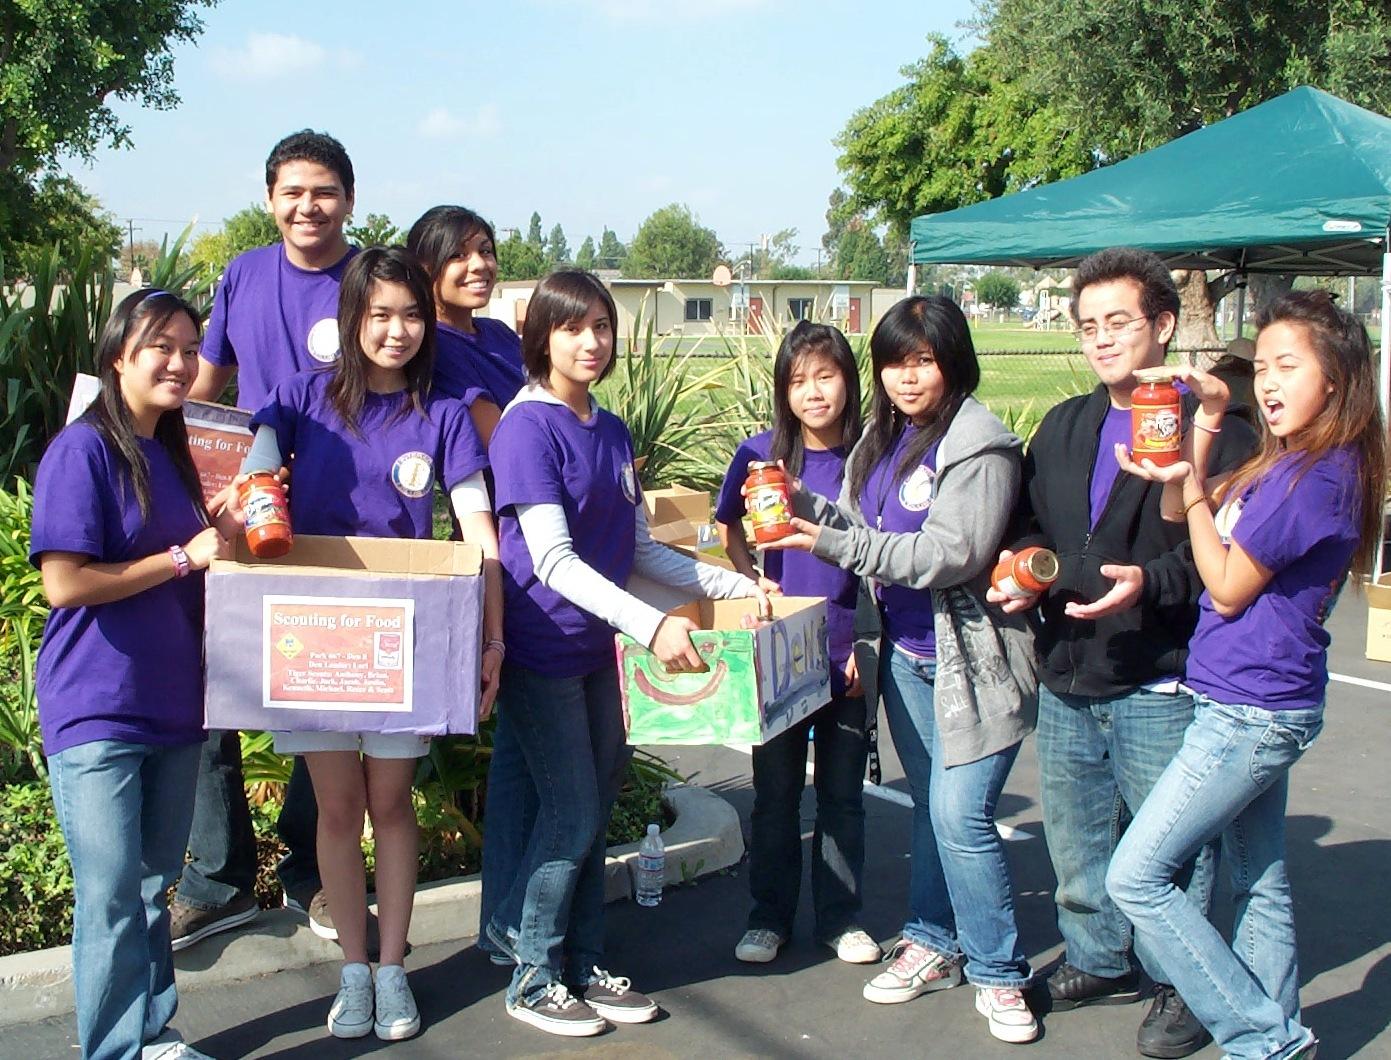 Savanna Interact Scouting for food 2007.JPG